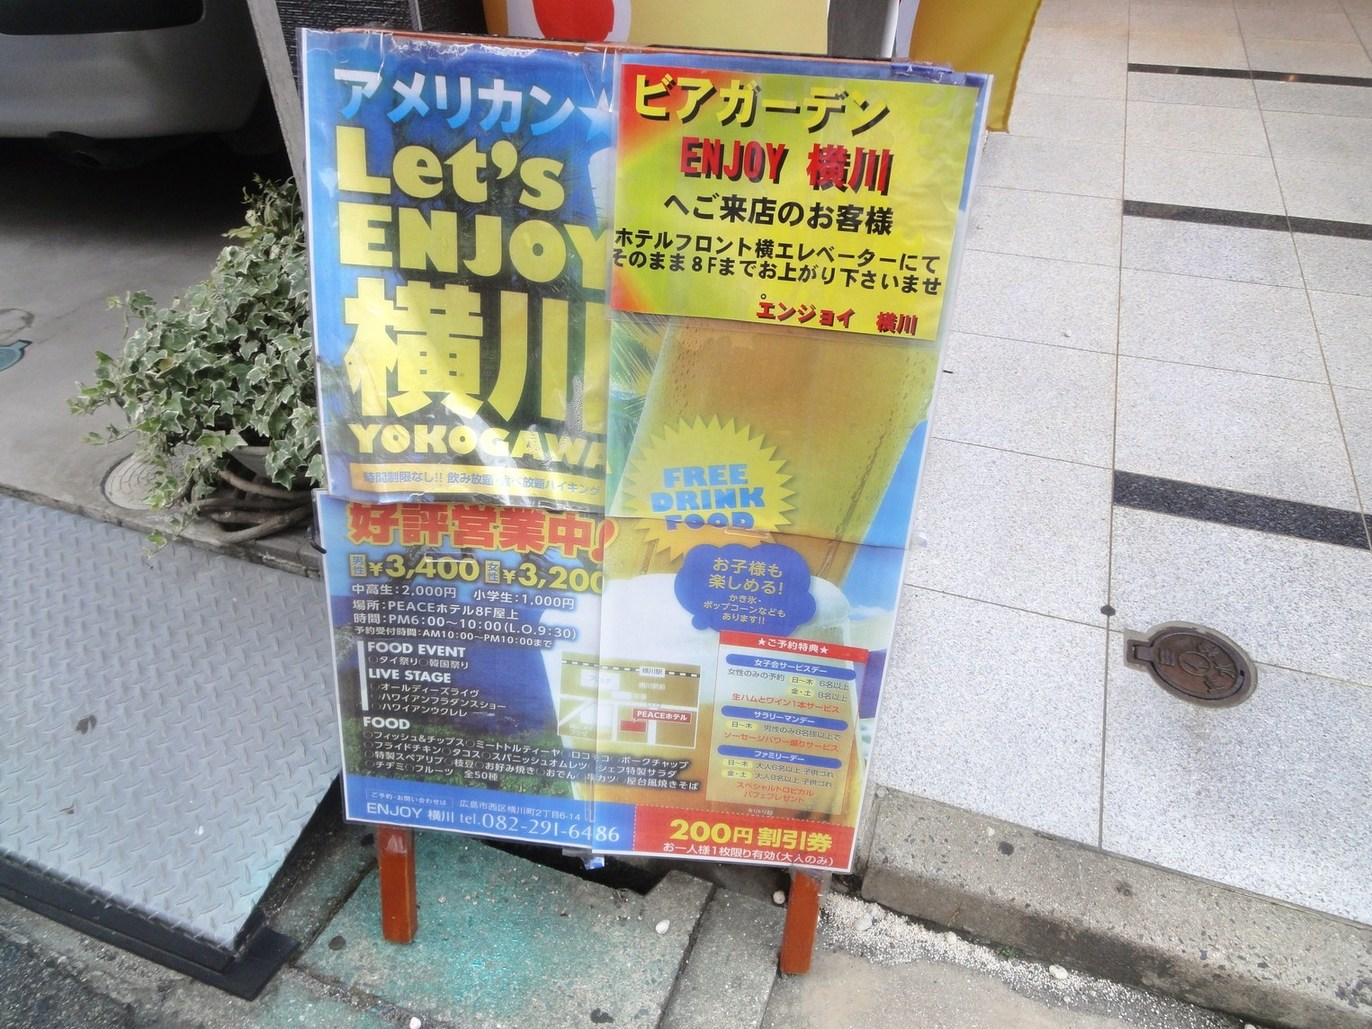 ENJOY横川ビアガーデン